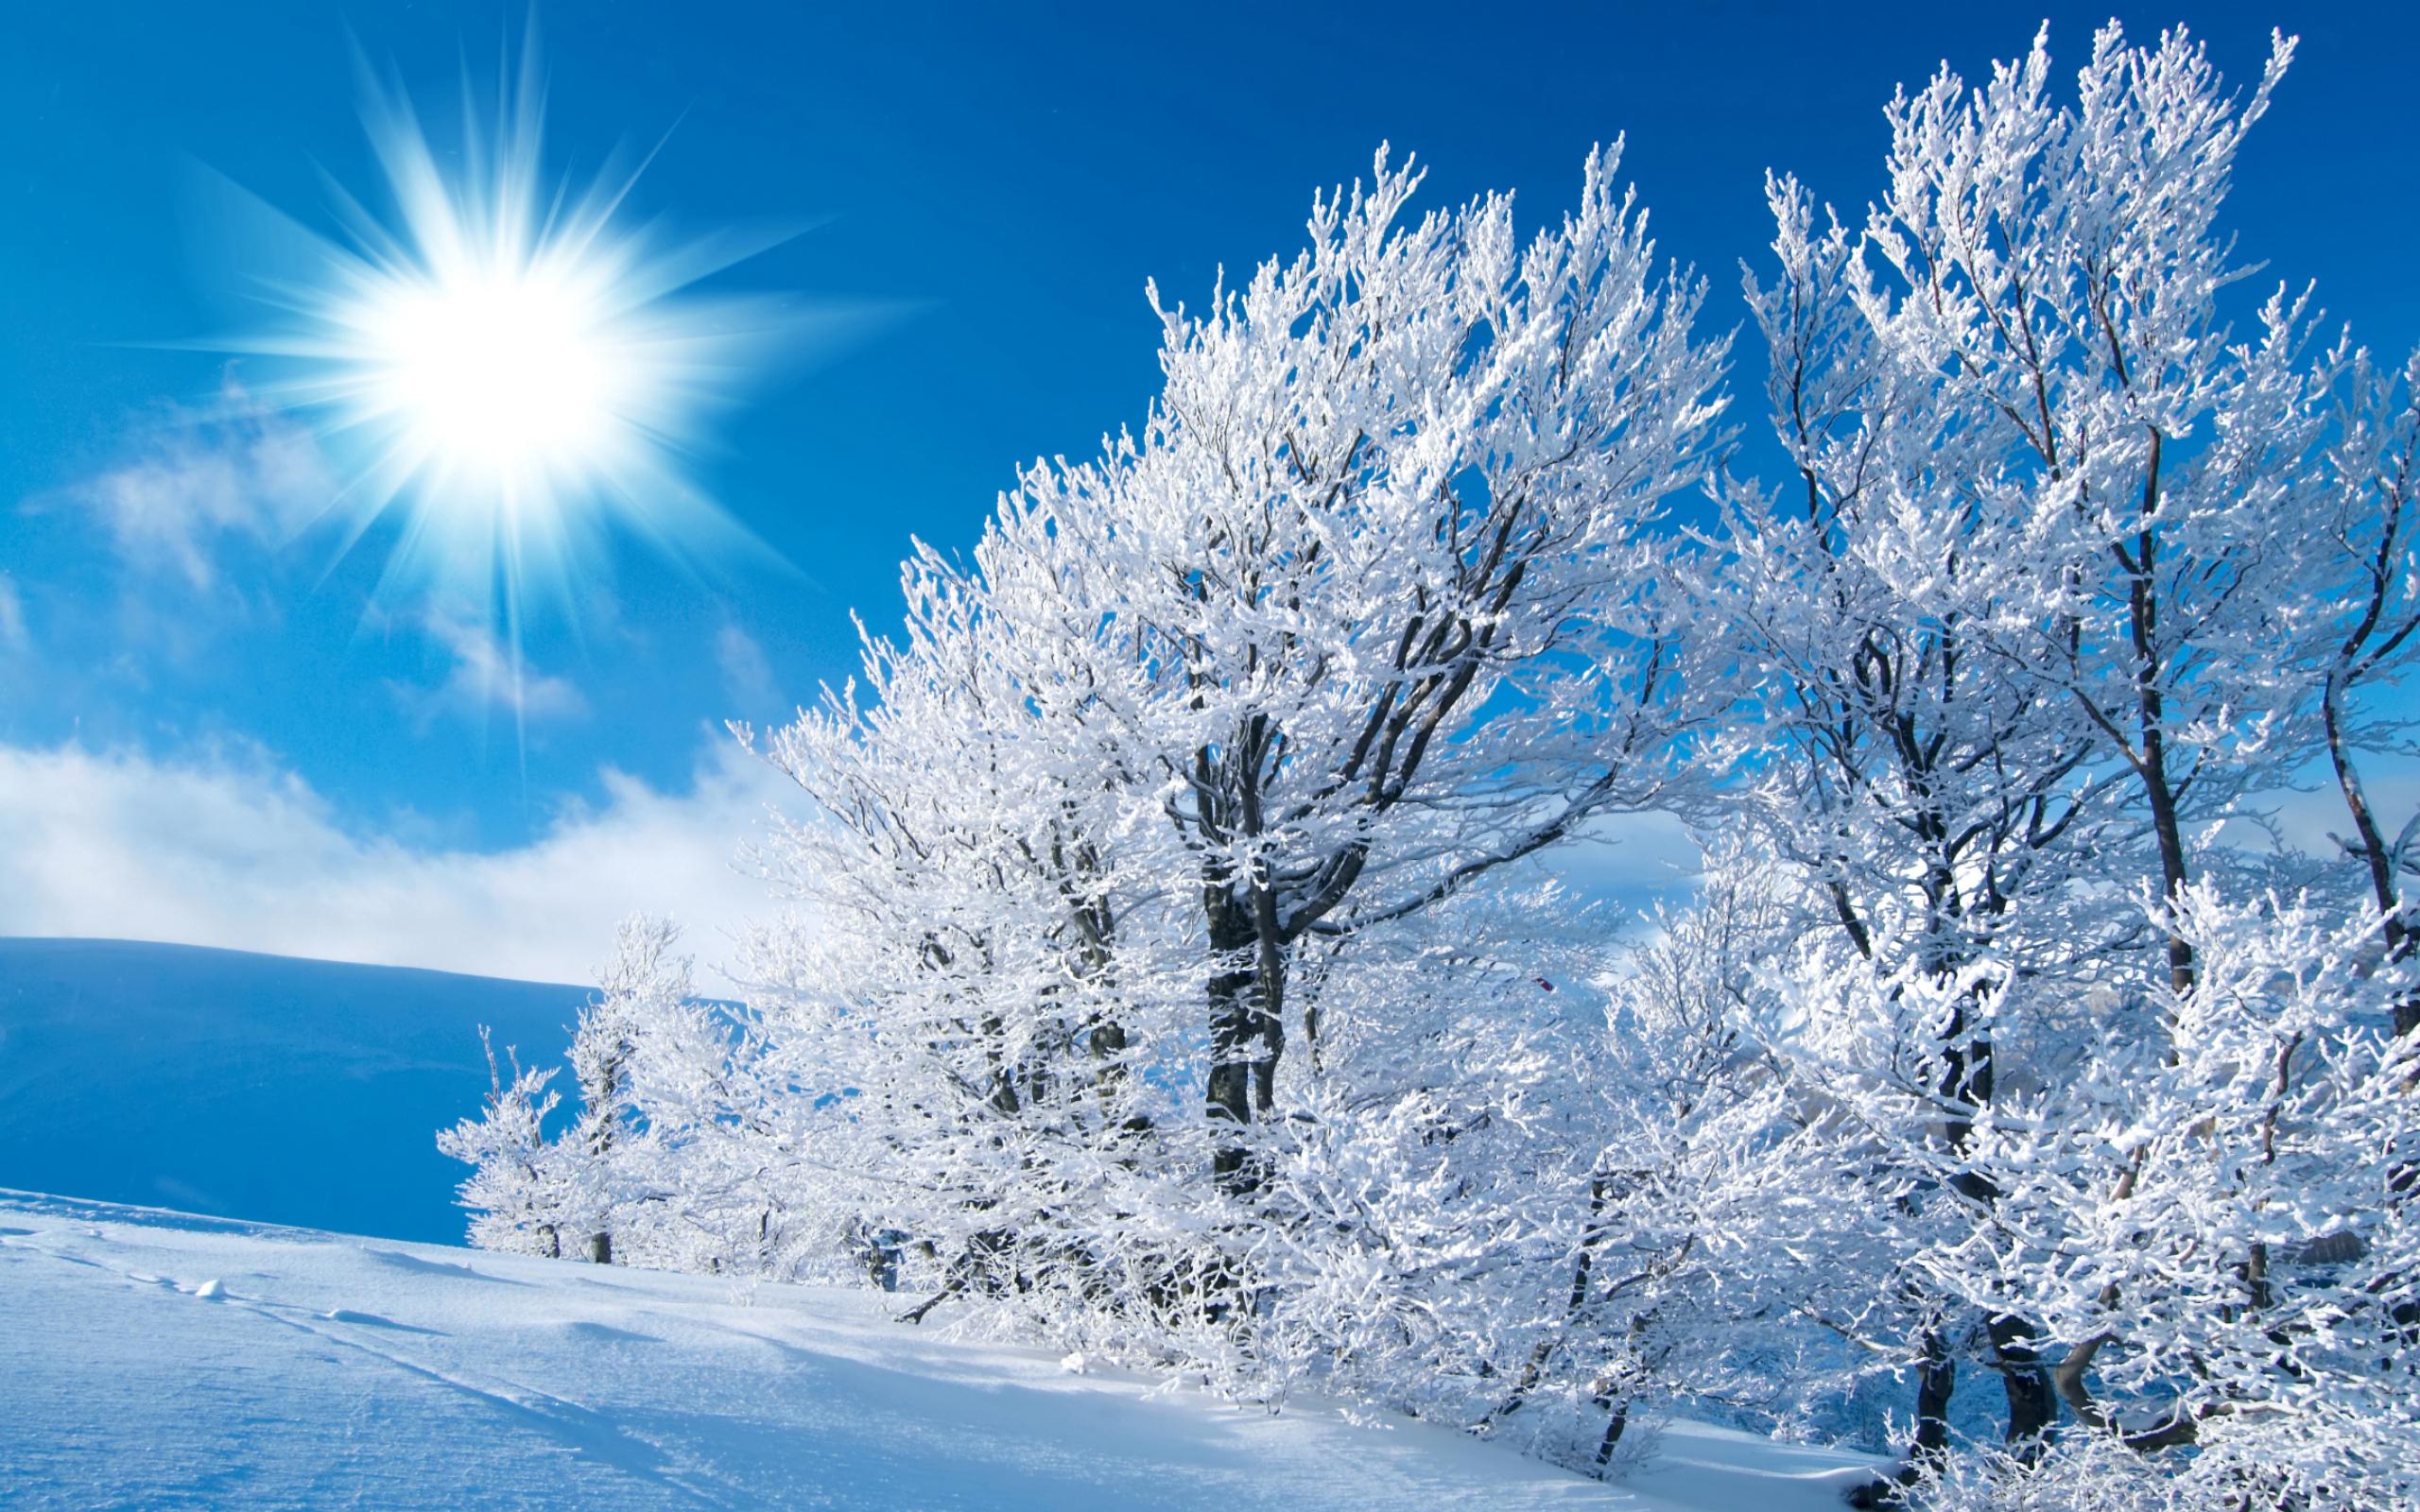 Winter Sun   Wallpaper High Definition High Quality 2560x1600